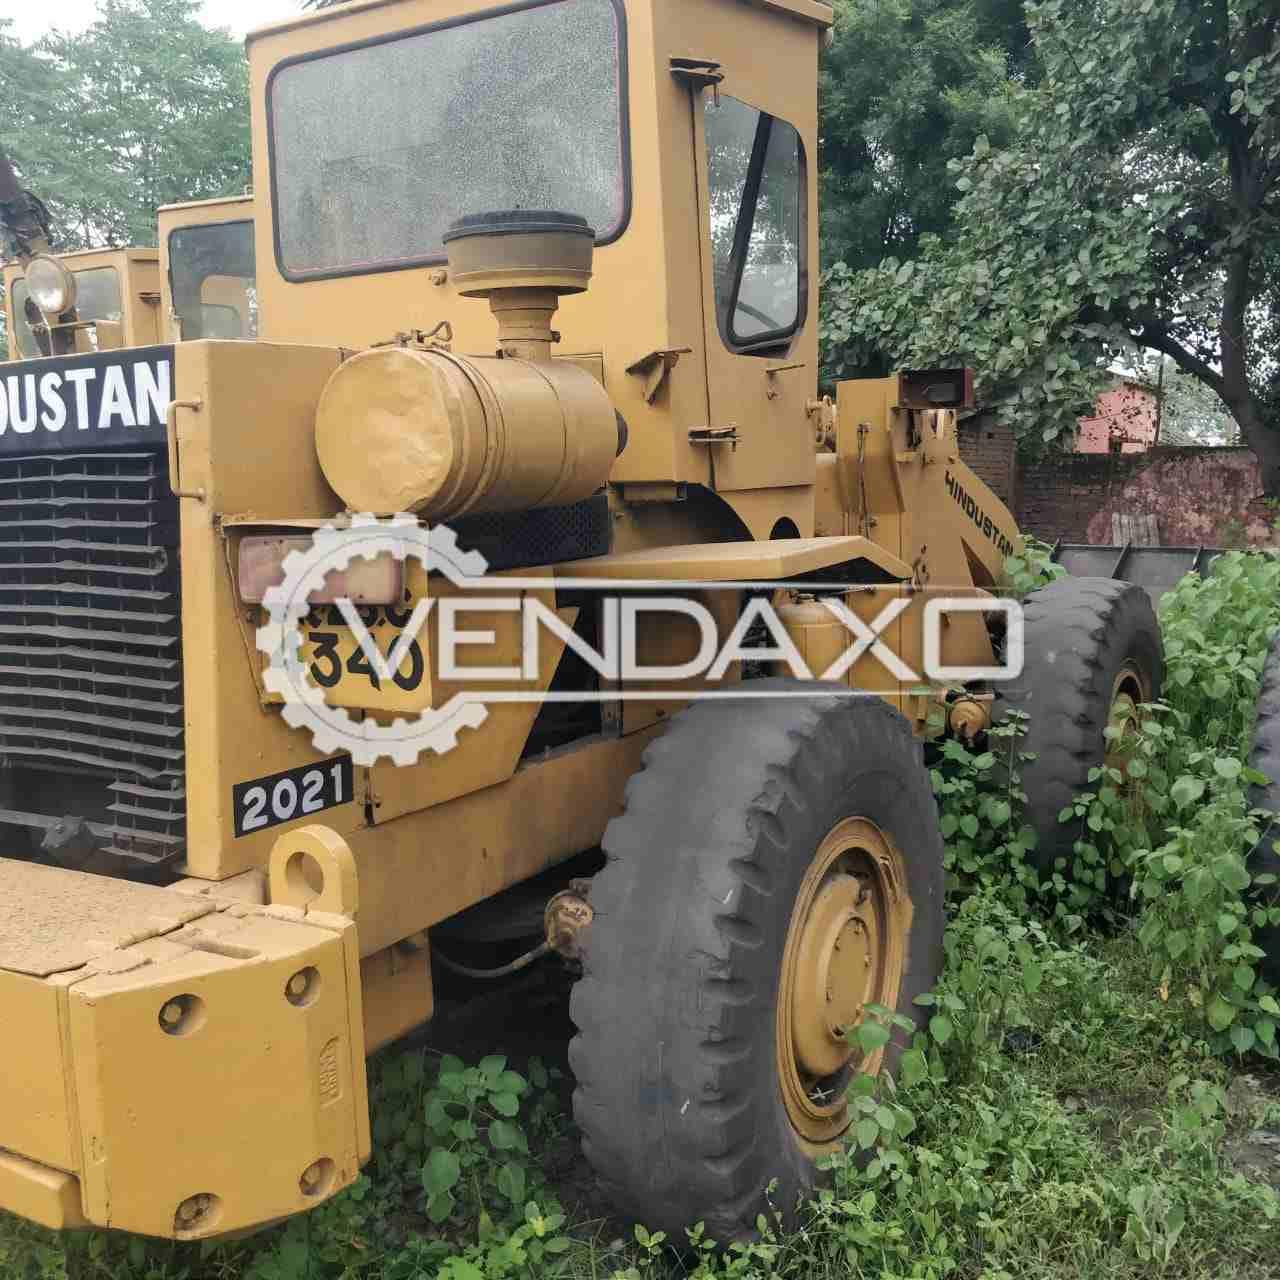 For Sale Used Hindustan HM-2021 Wheel Loader Machine - 112 HP, 2009 Model